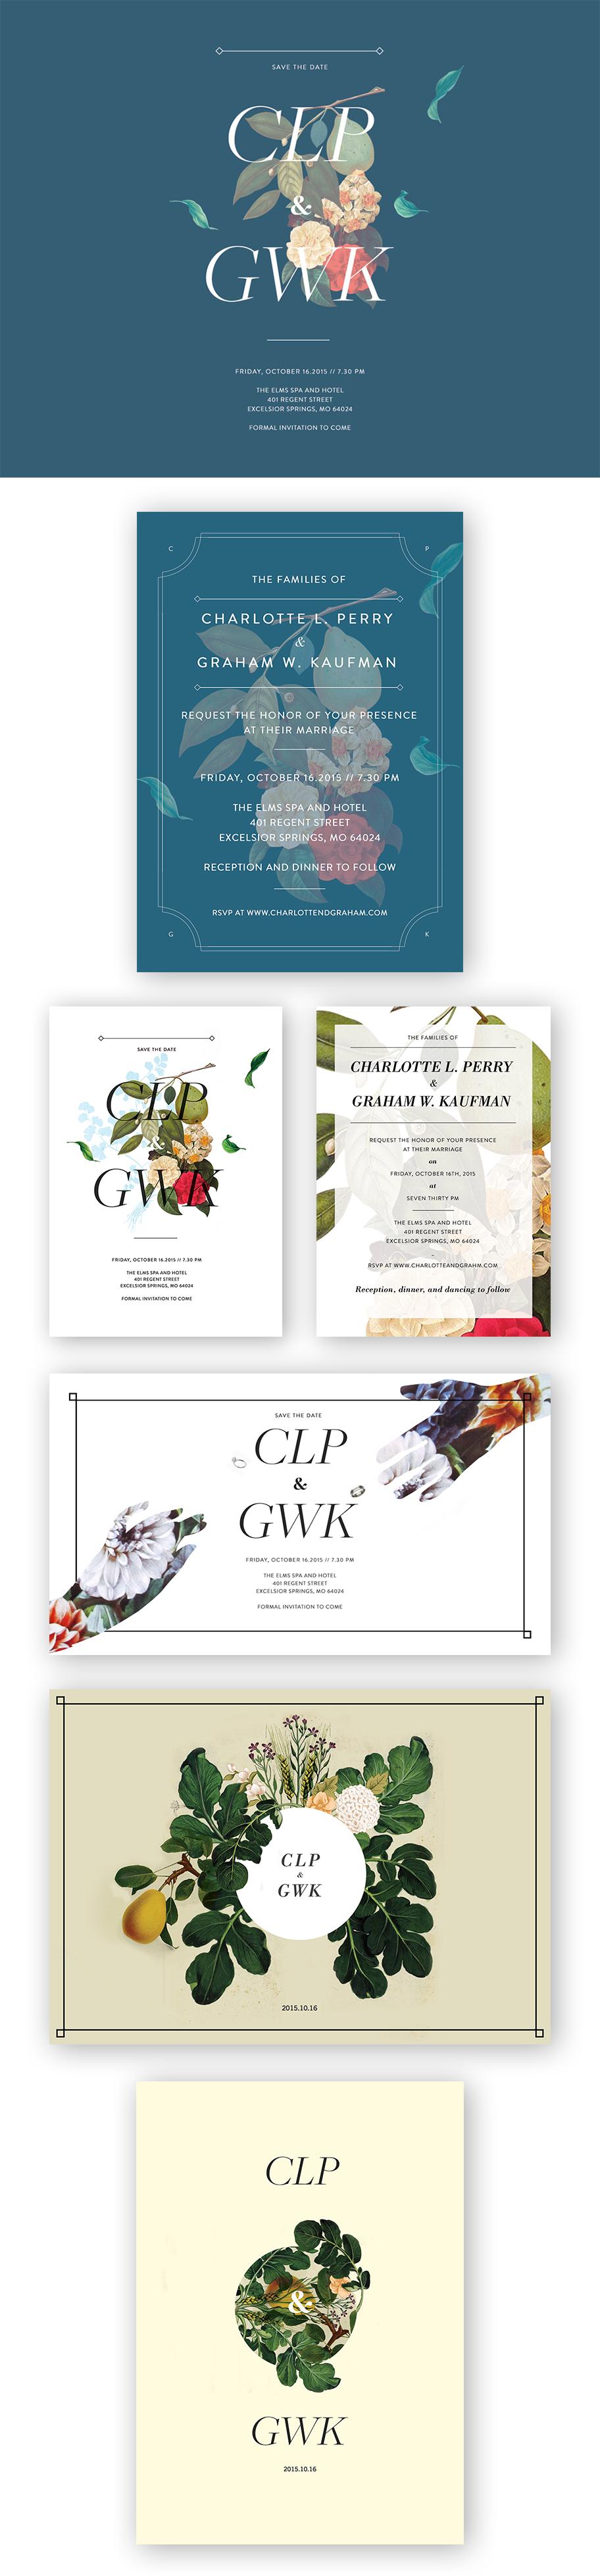 wedding invitation, save the date, wedding stationery design